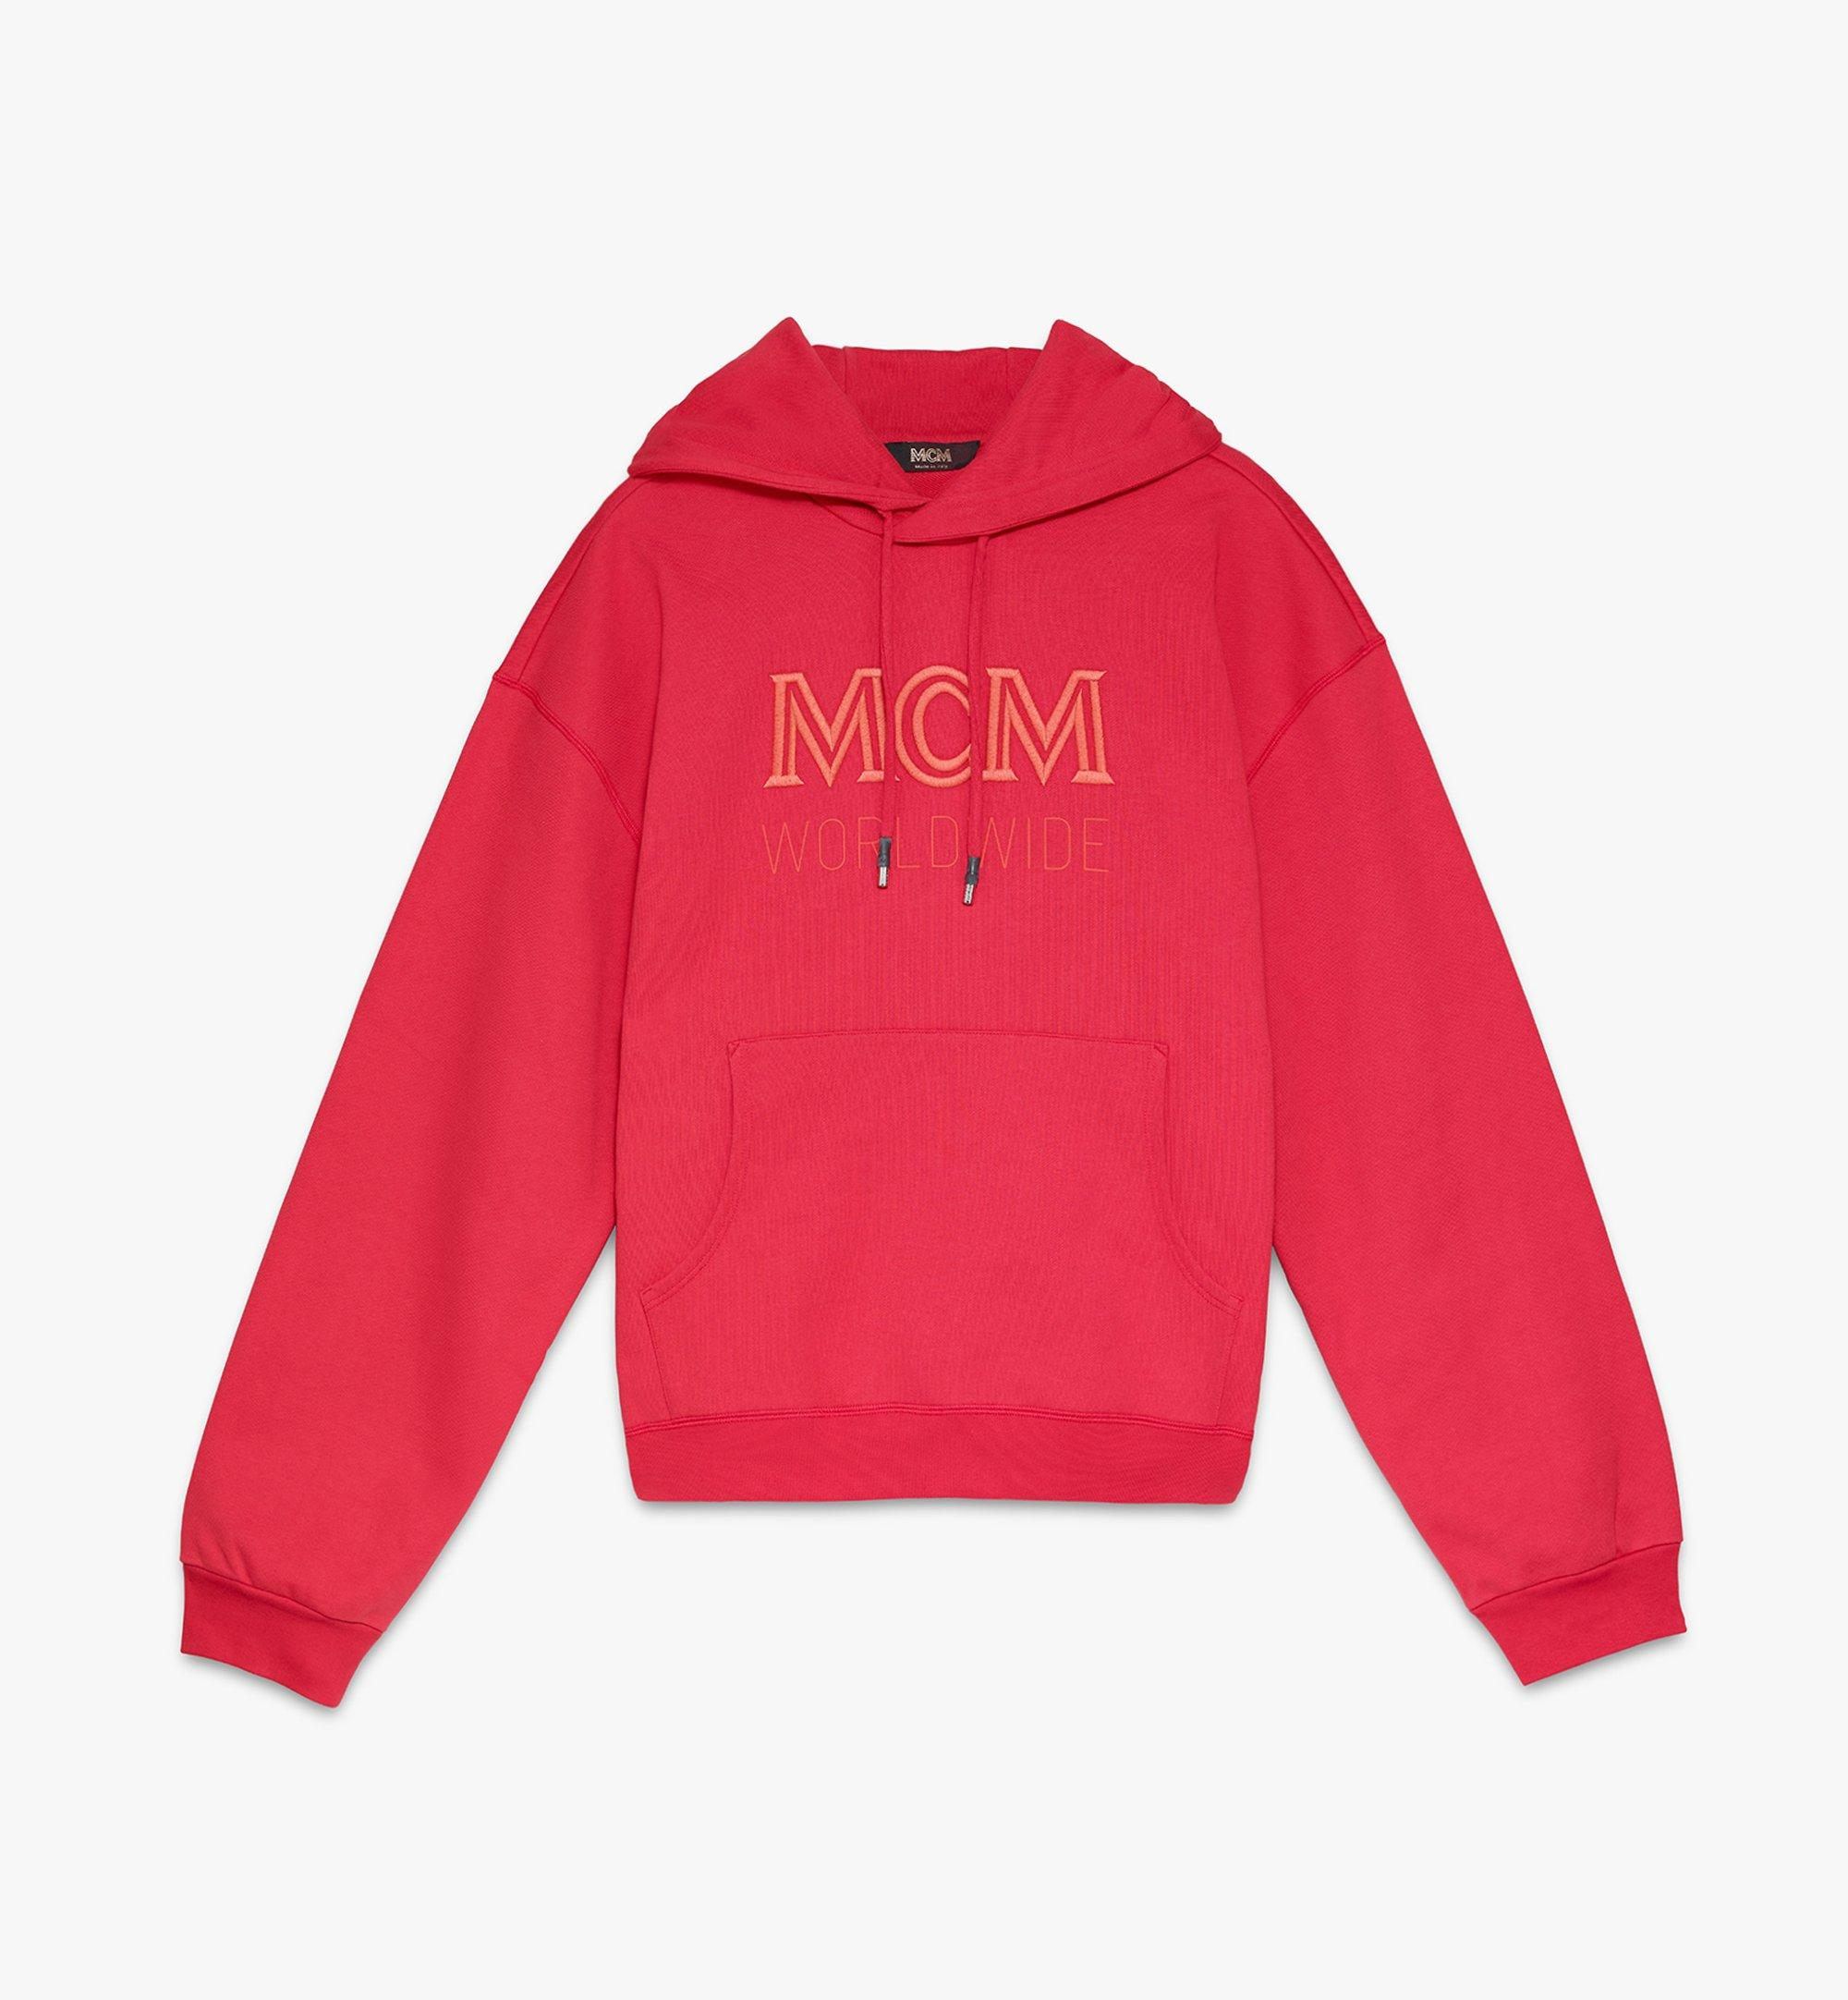 MCM MCM 男士 Worldwide 連帽上衣 Red MHAASMM03R400L 更多視圖 1